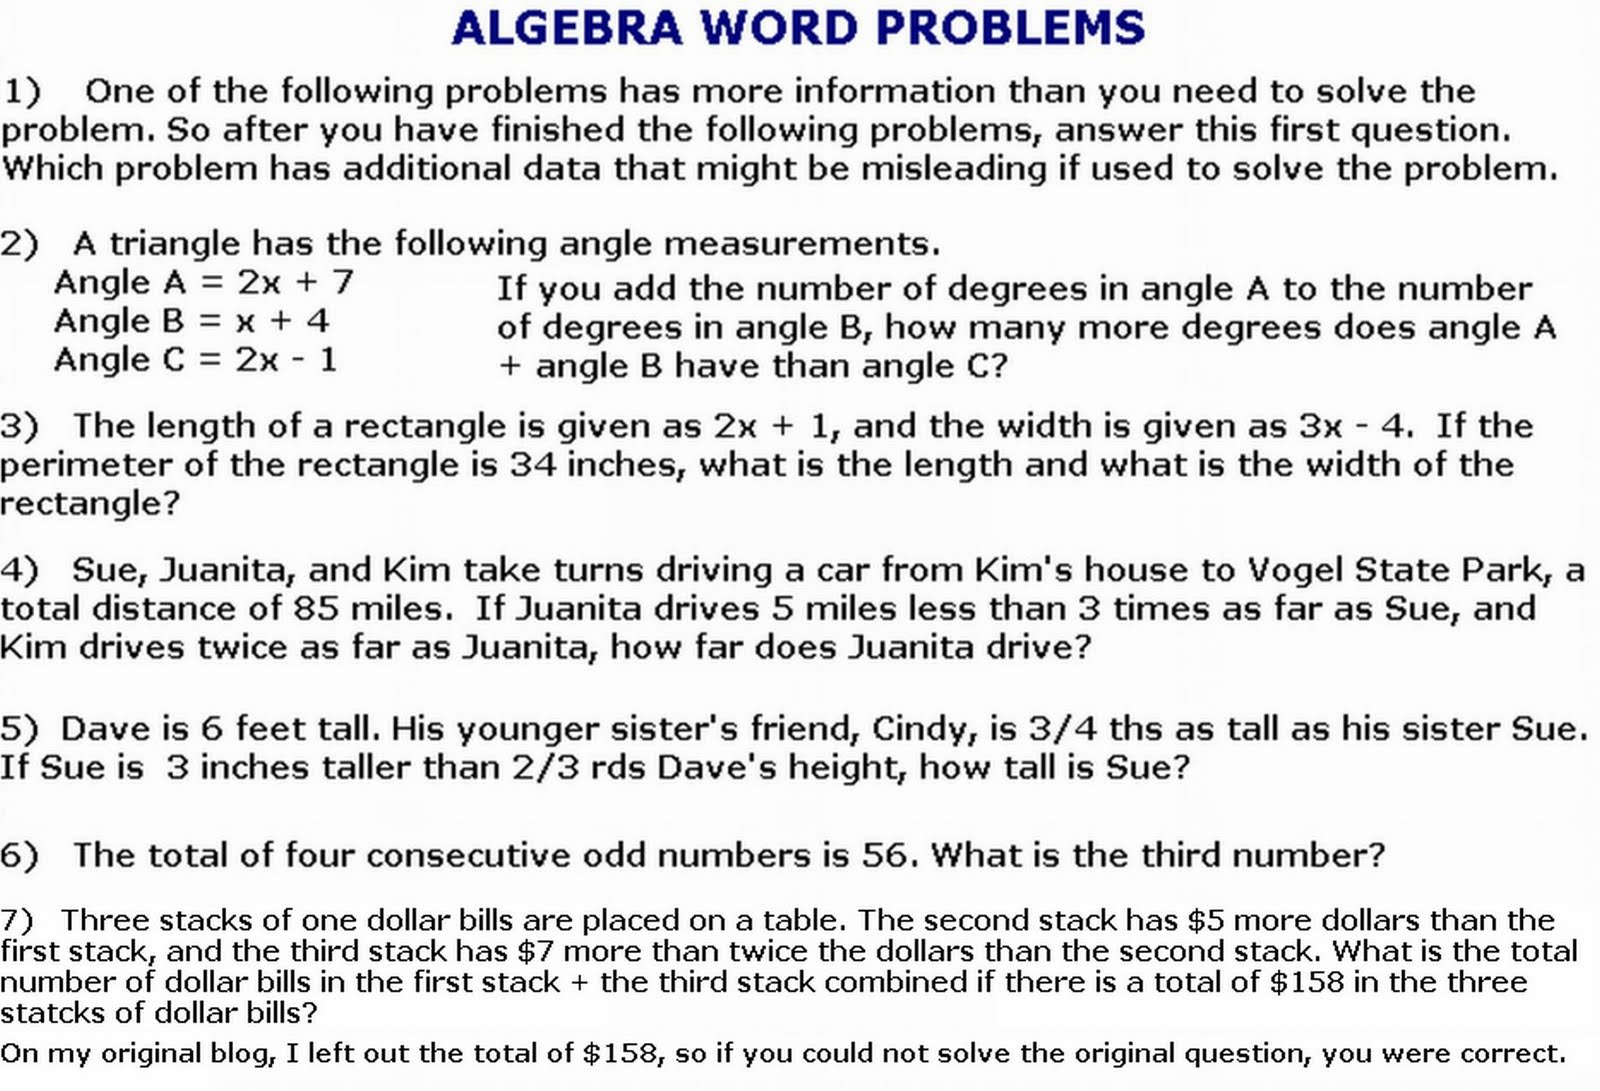 Printables Algebra 1 Word Problems Worksheets easter word problems ks2 math activities printable worksheets algebra 1 problems